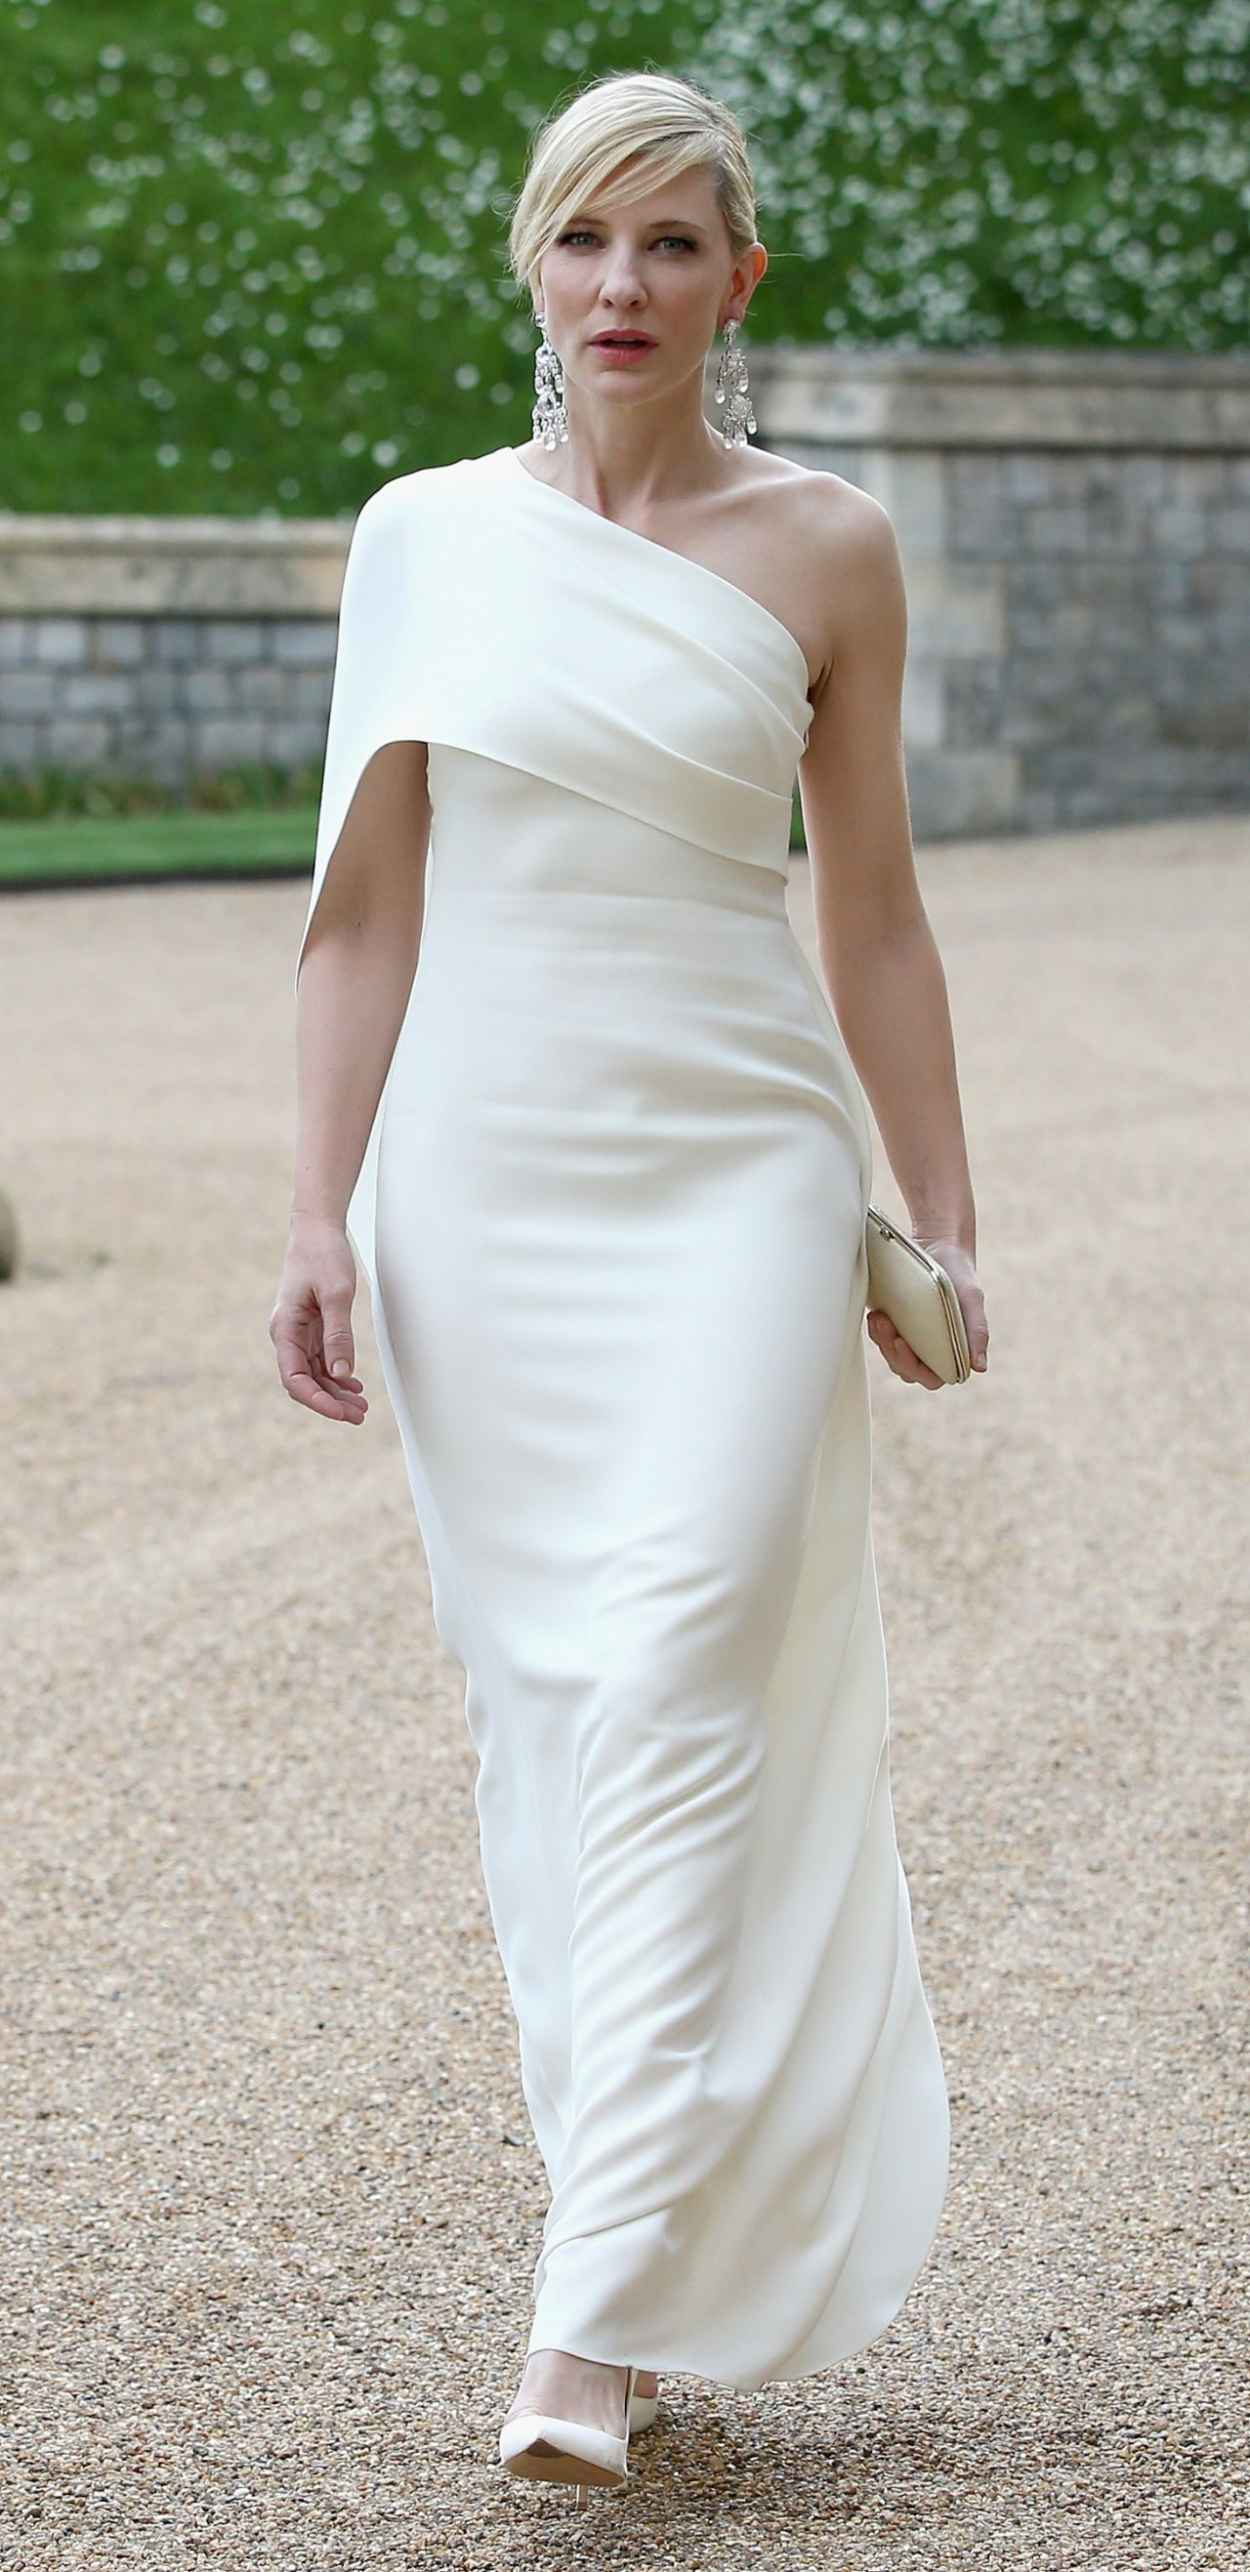 Cate Blanchett Wearing Ralph Lauren Gown - The Duke of Cambridge Celebrates The Royal Marsden in Windsor-1